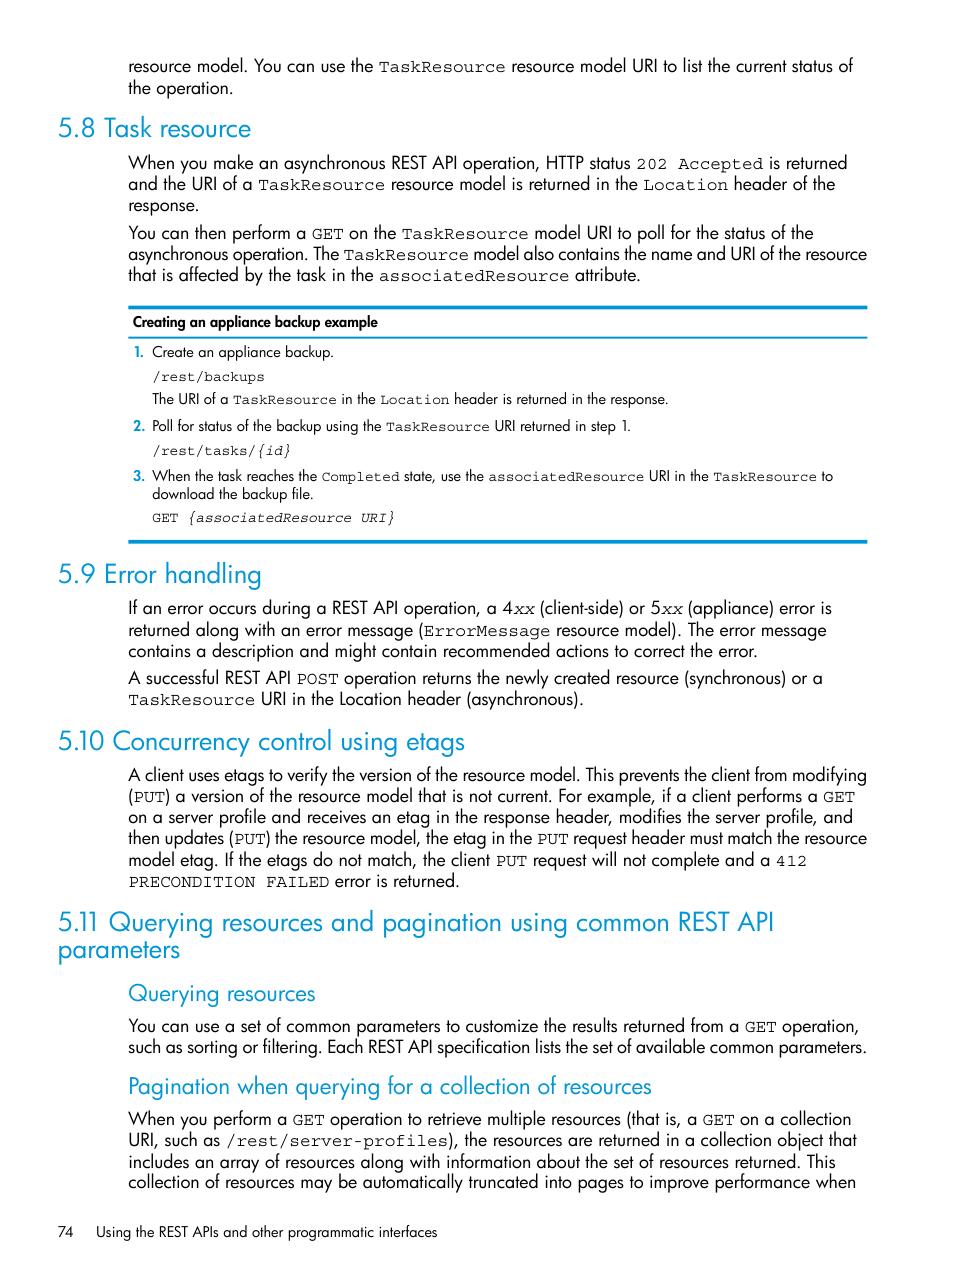 8 task resource, 9 error handling, 10 concurrency control using